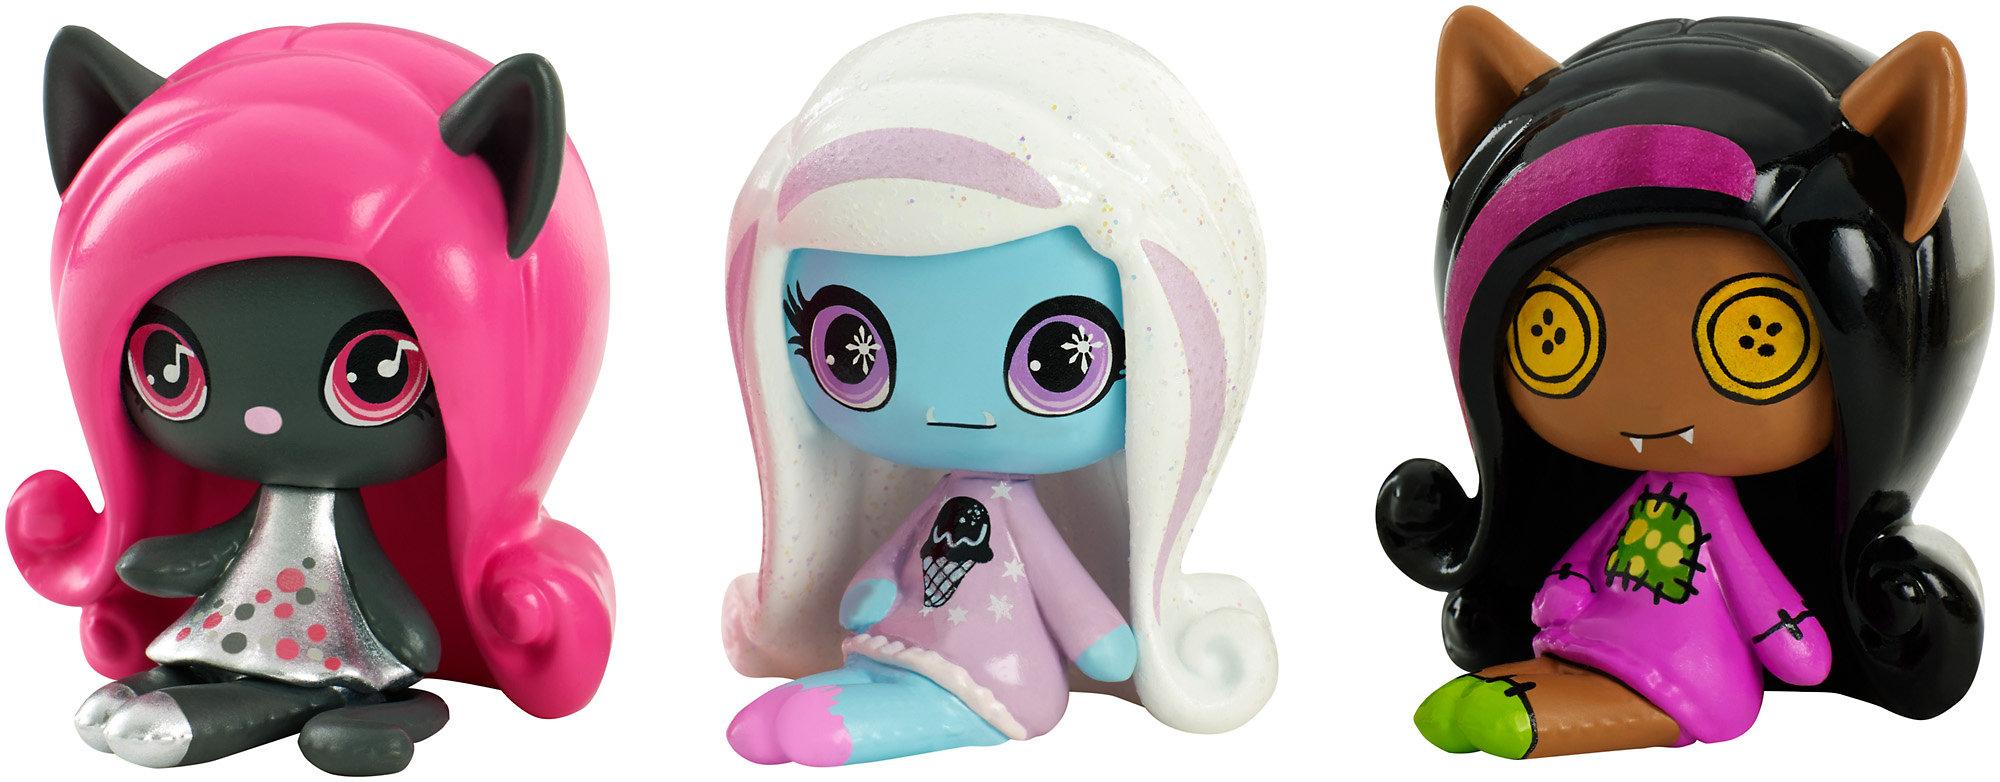 Monster High Minis Figure (3-Pack) by MATTEL INC.